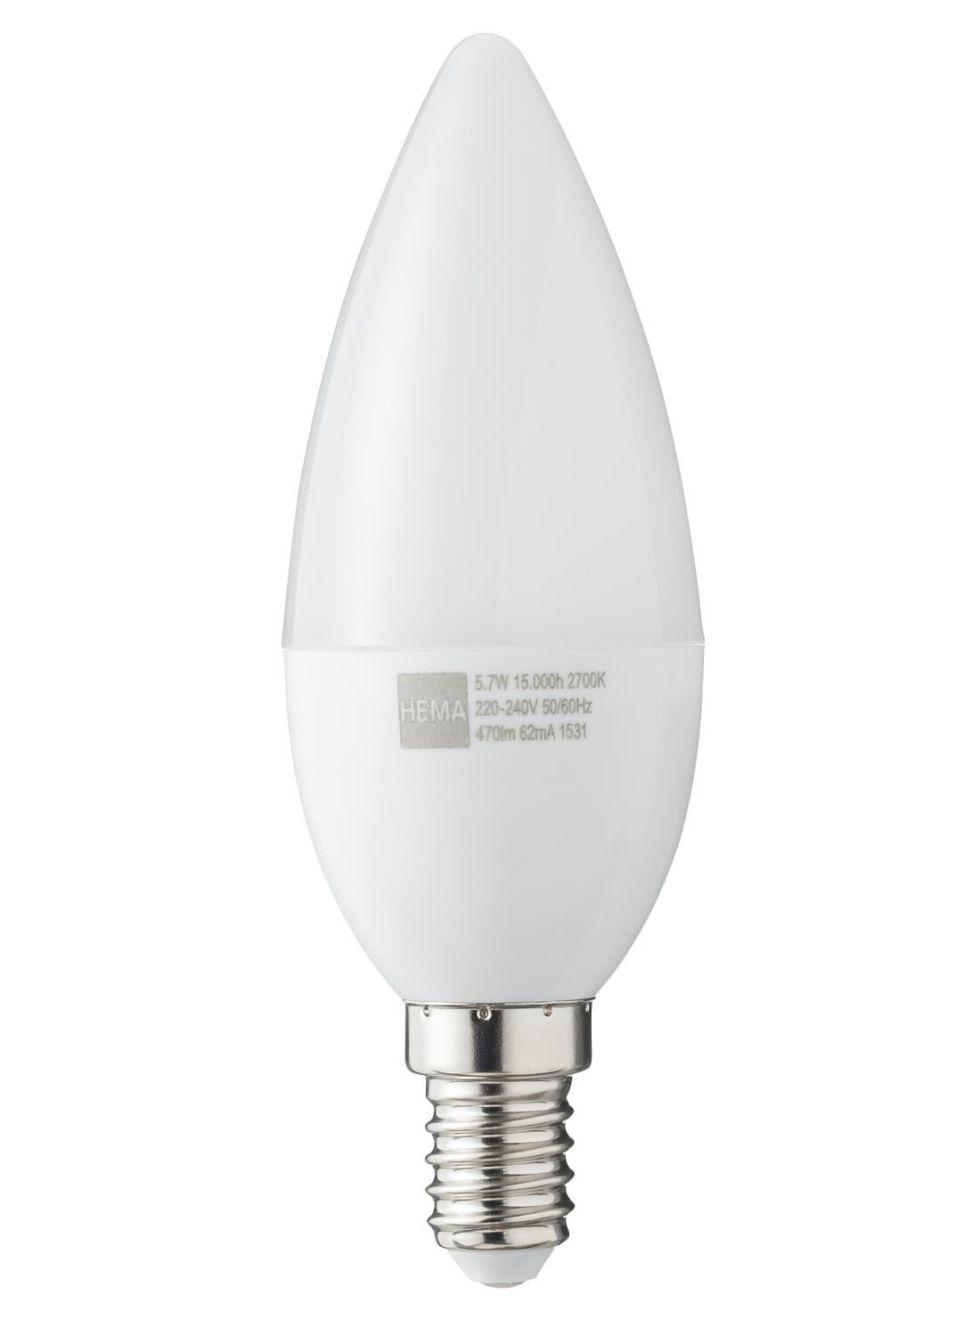 HEMA LED Kaarslamp 40w - MyDailyShopper